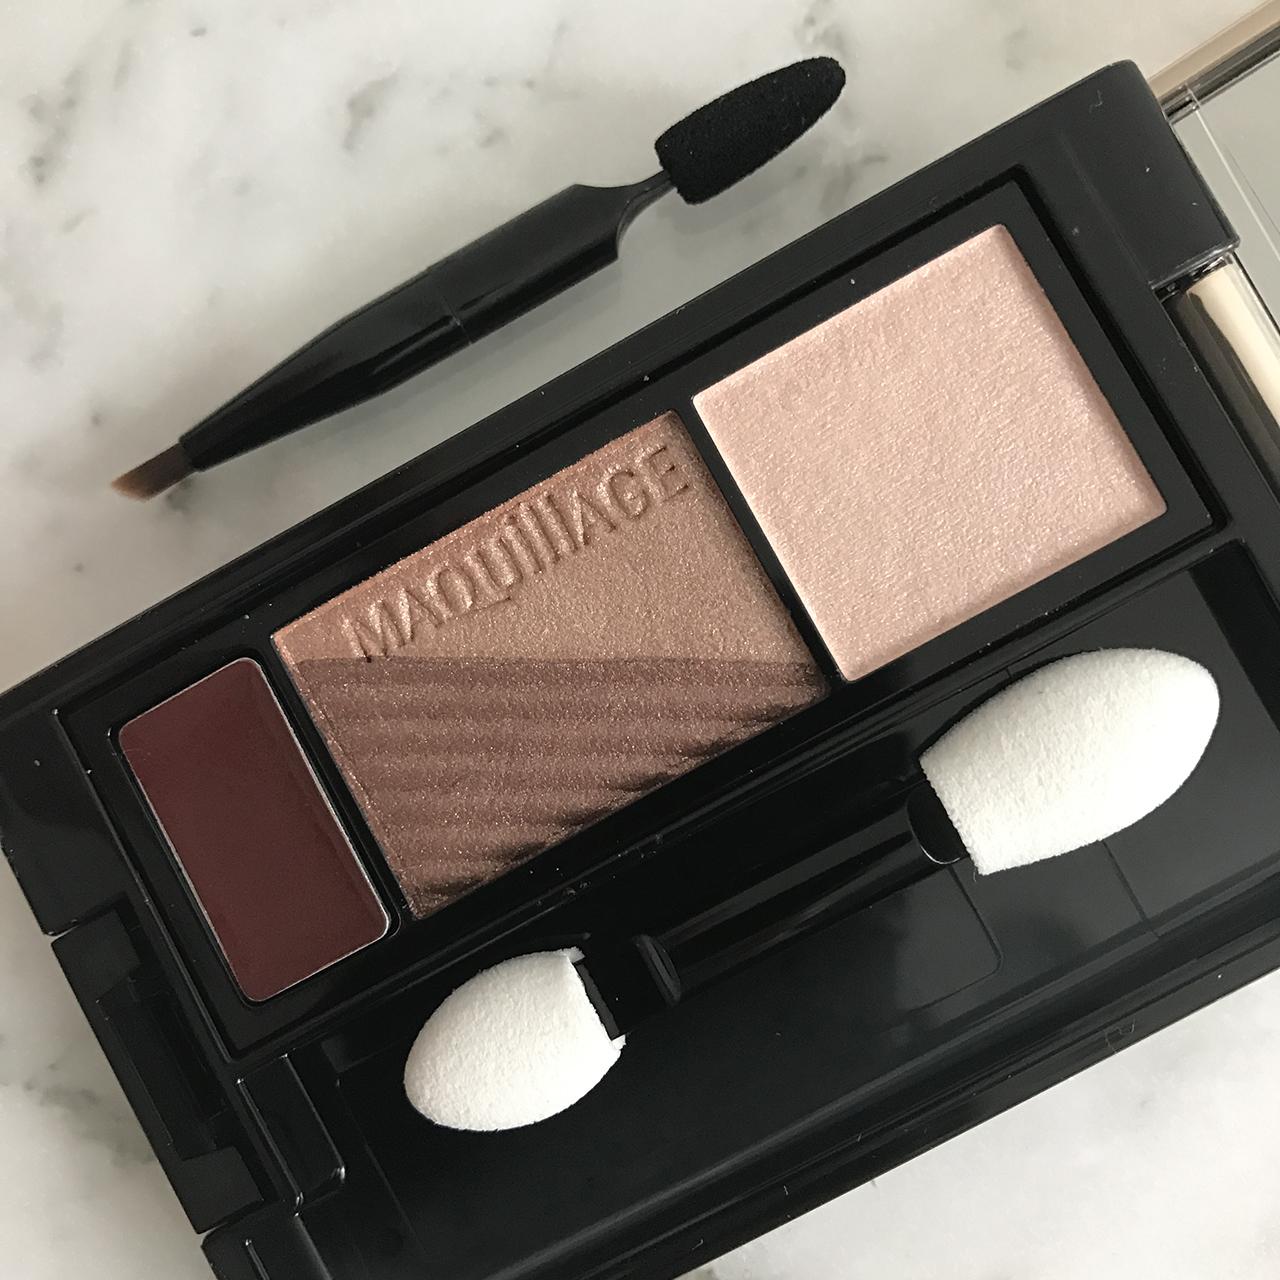 Shiseido Maquillage Dramatic Mood Eyes BR616